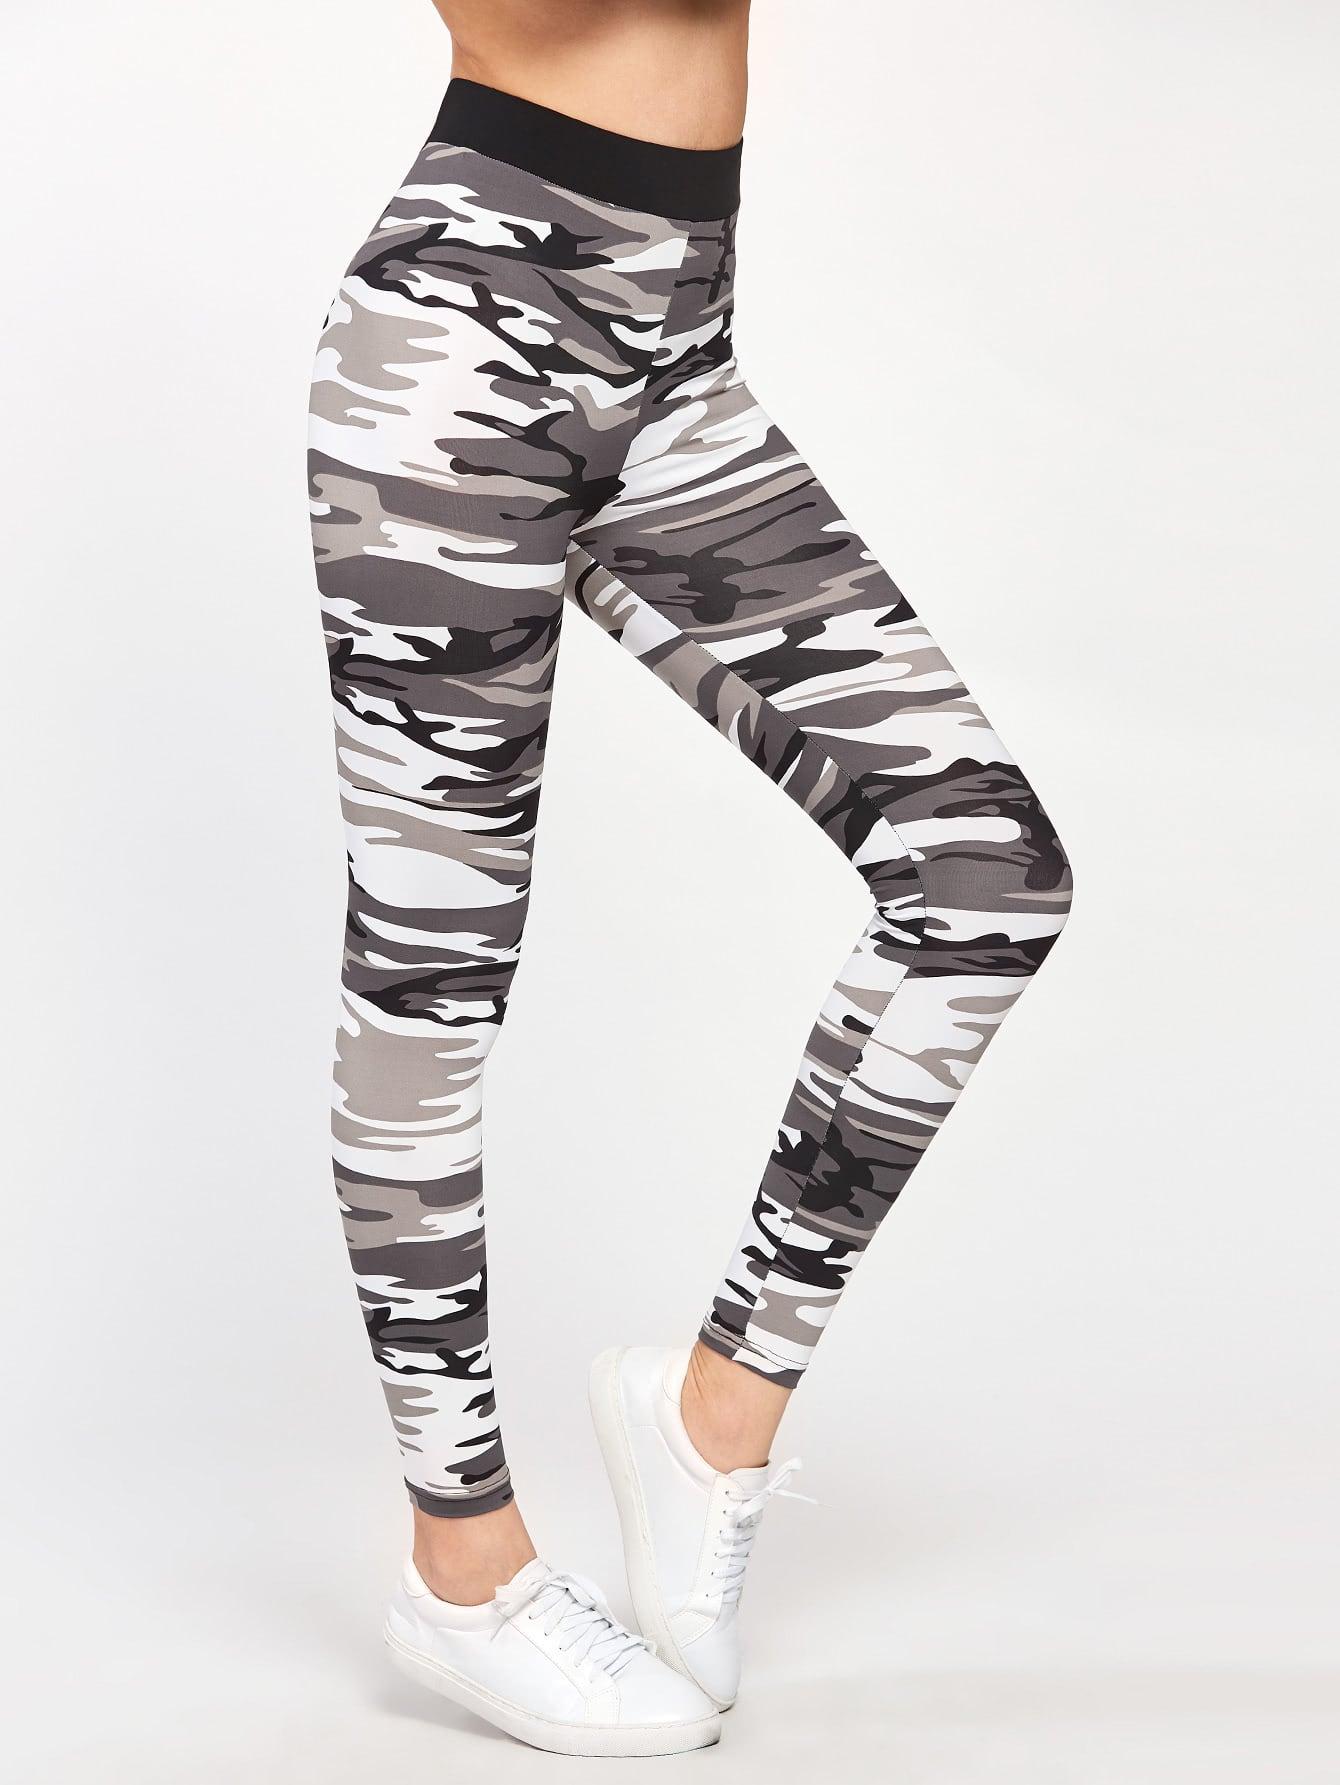 Contrast Waist Camo Leggings wide waist camo print leggings